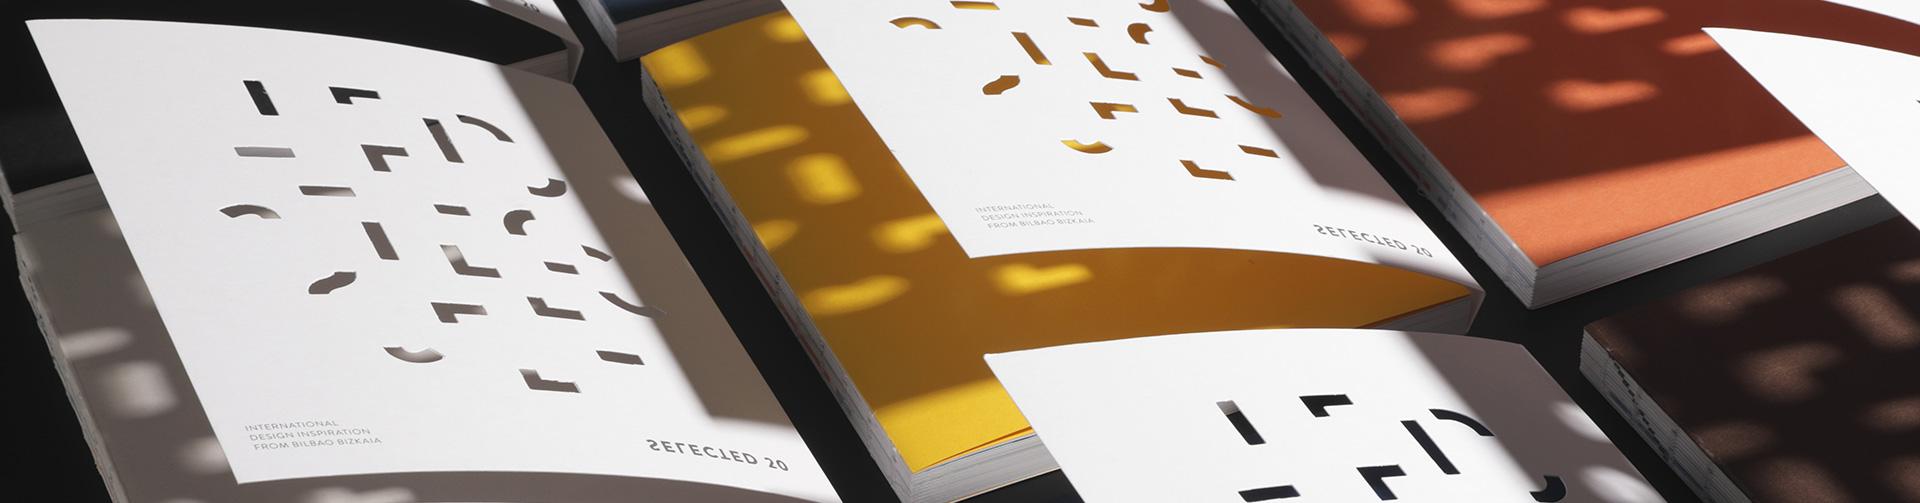 Libro Selected 2020 by Otzarreta Think & Make